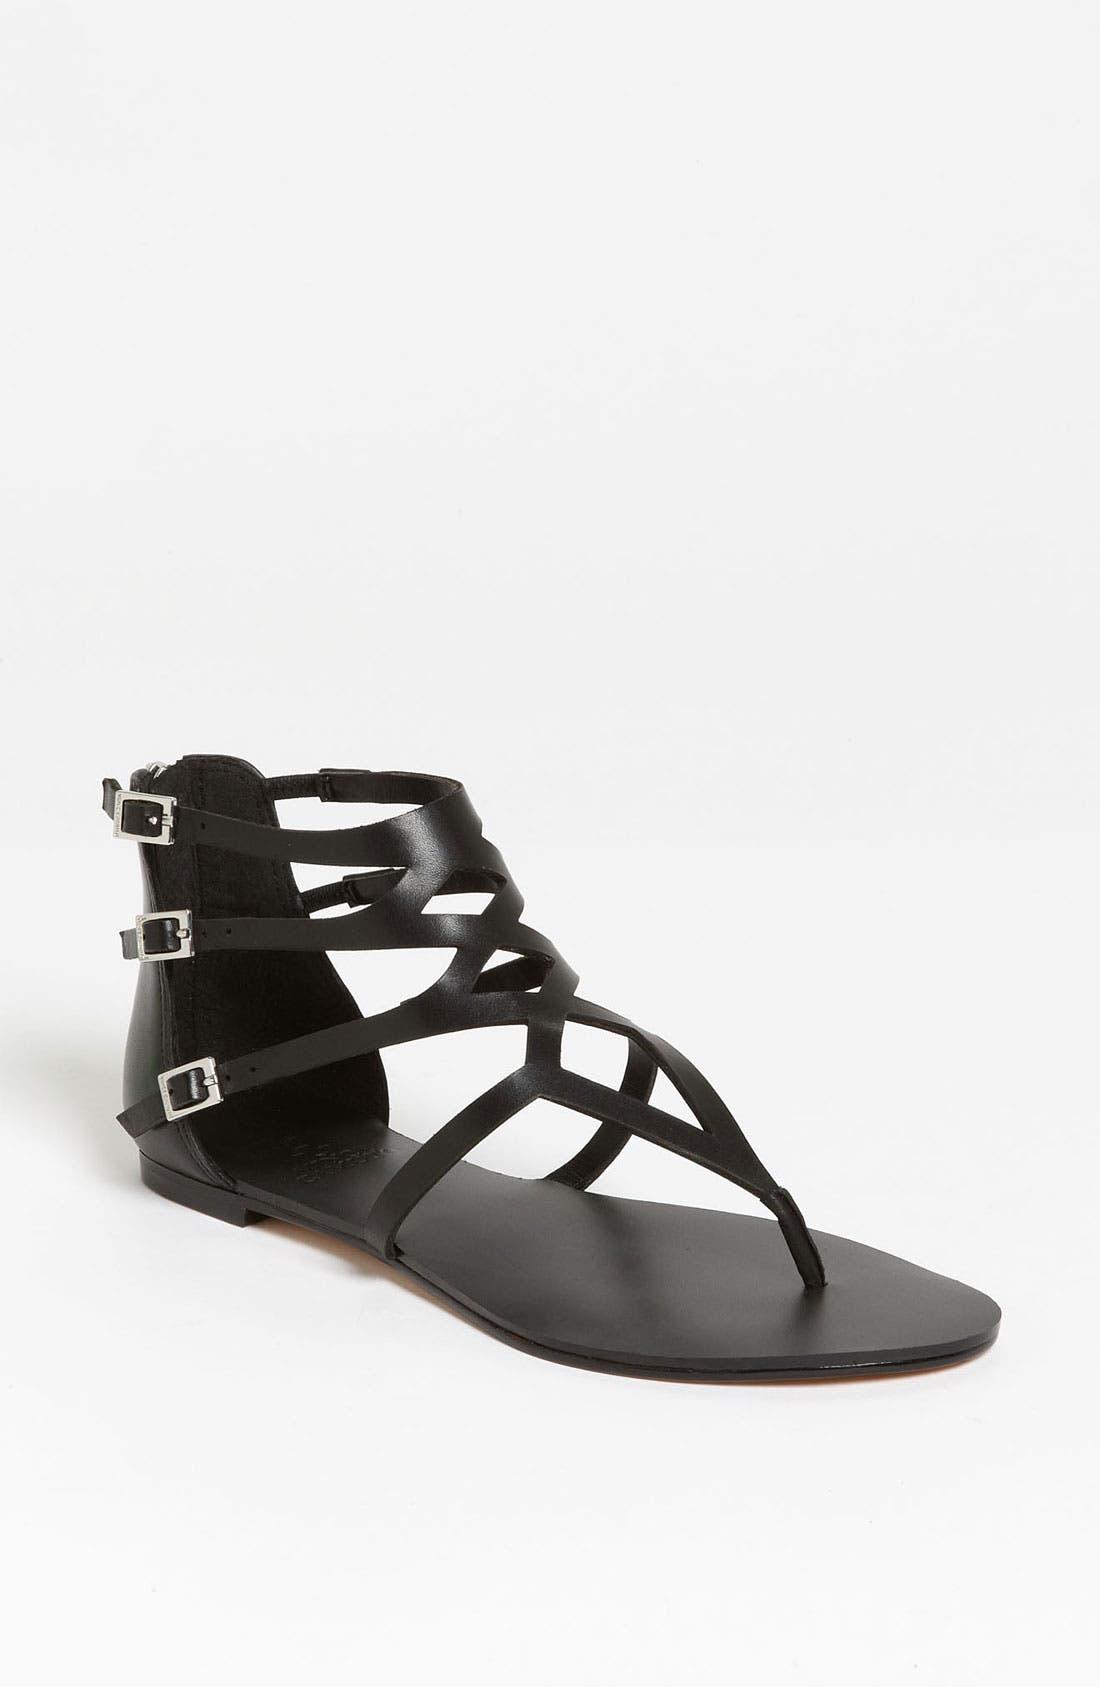 Main Image - Vince Camuto 'Ebi' Sandal